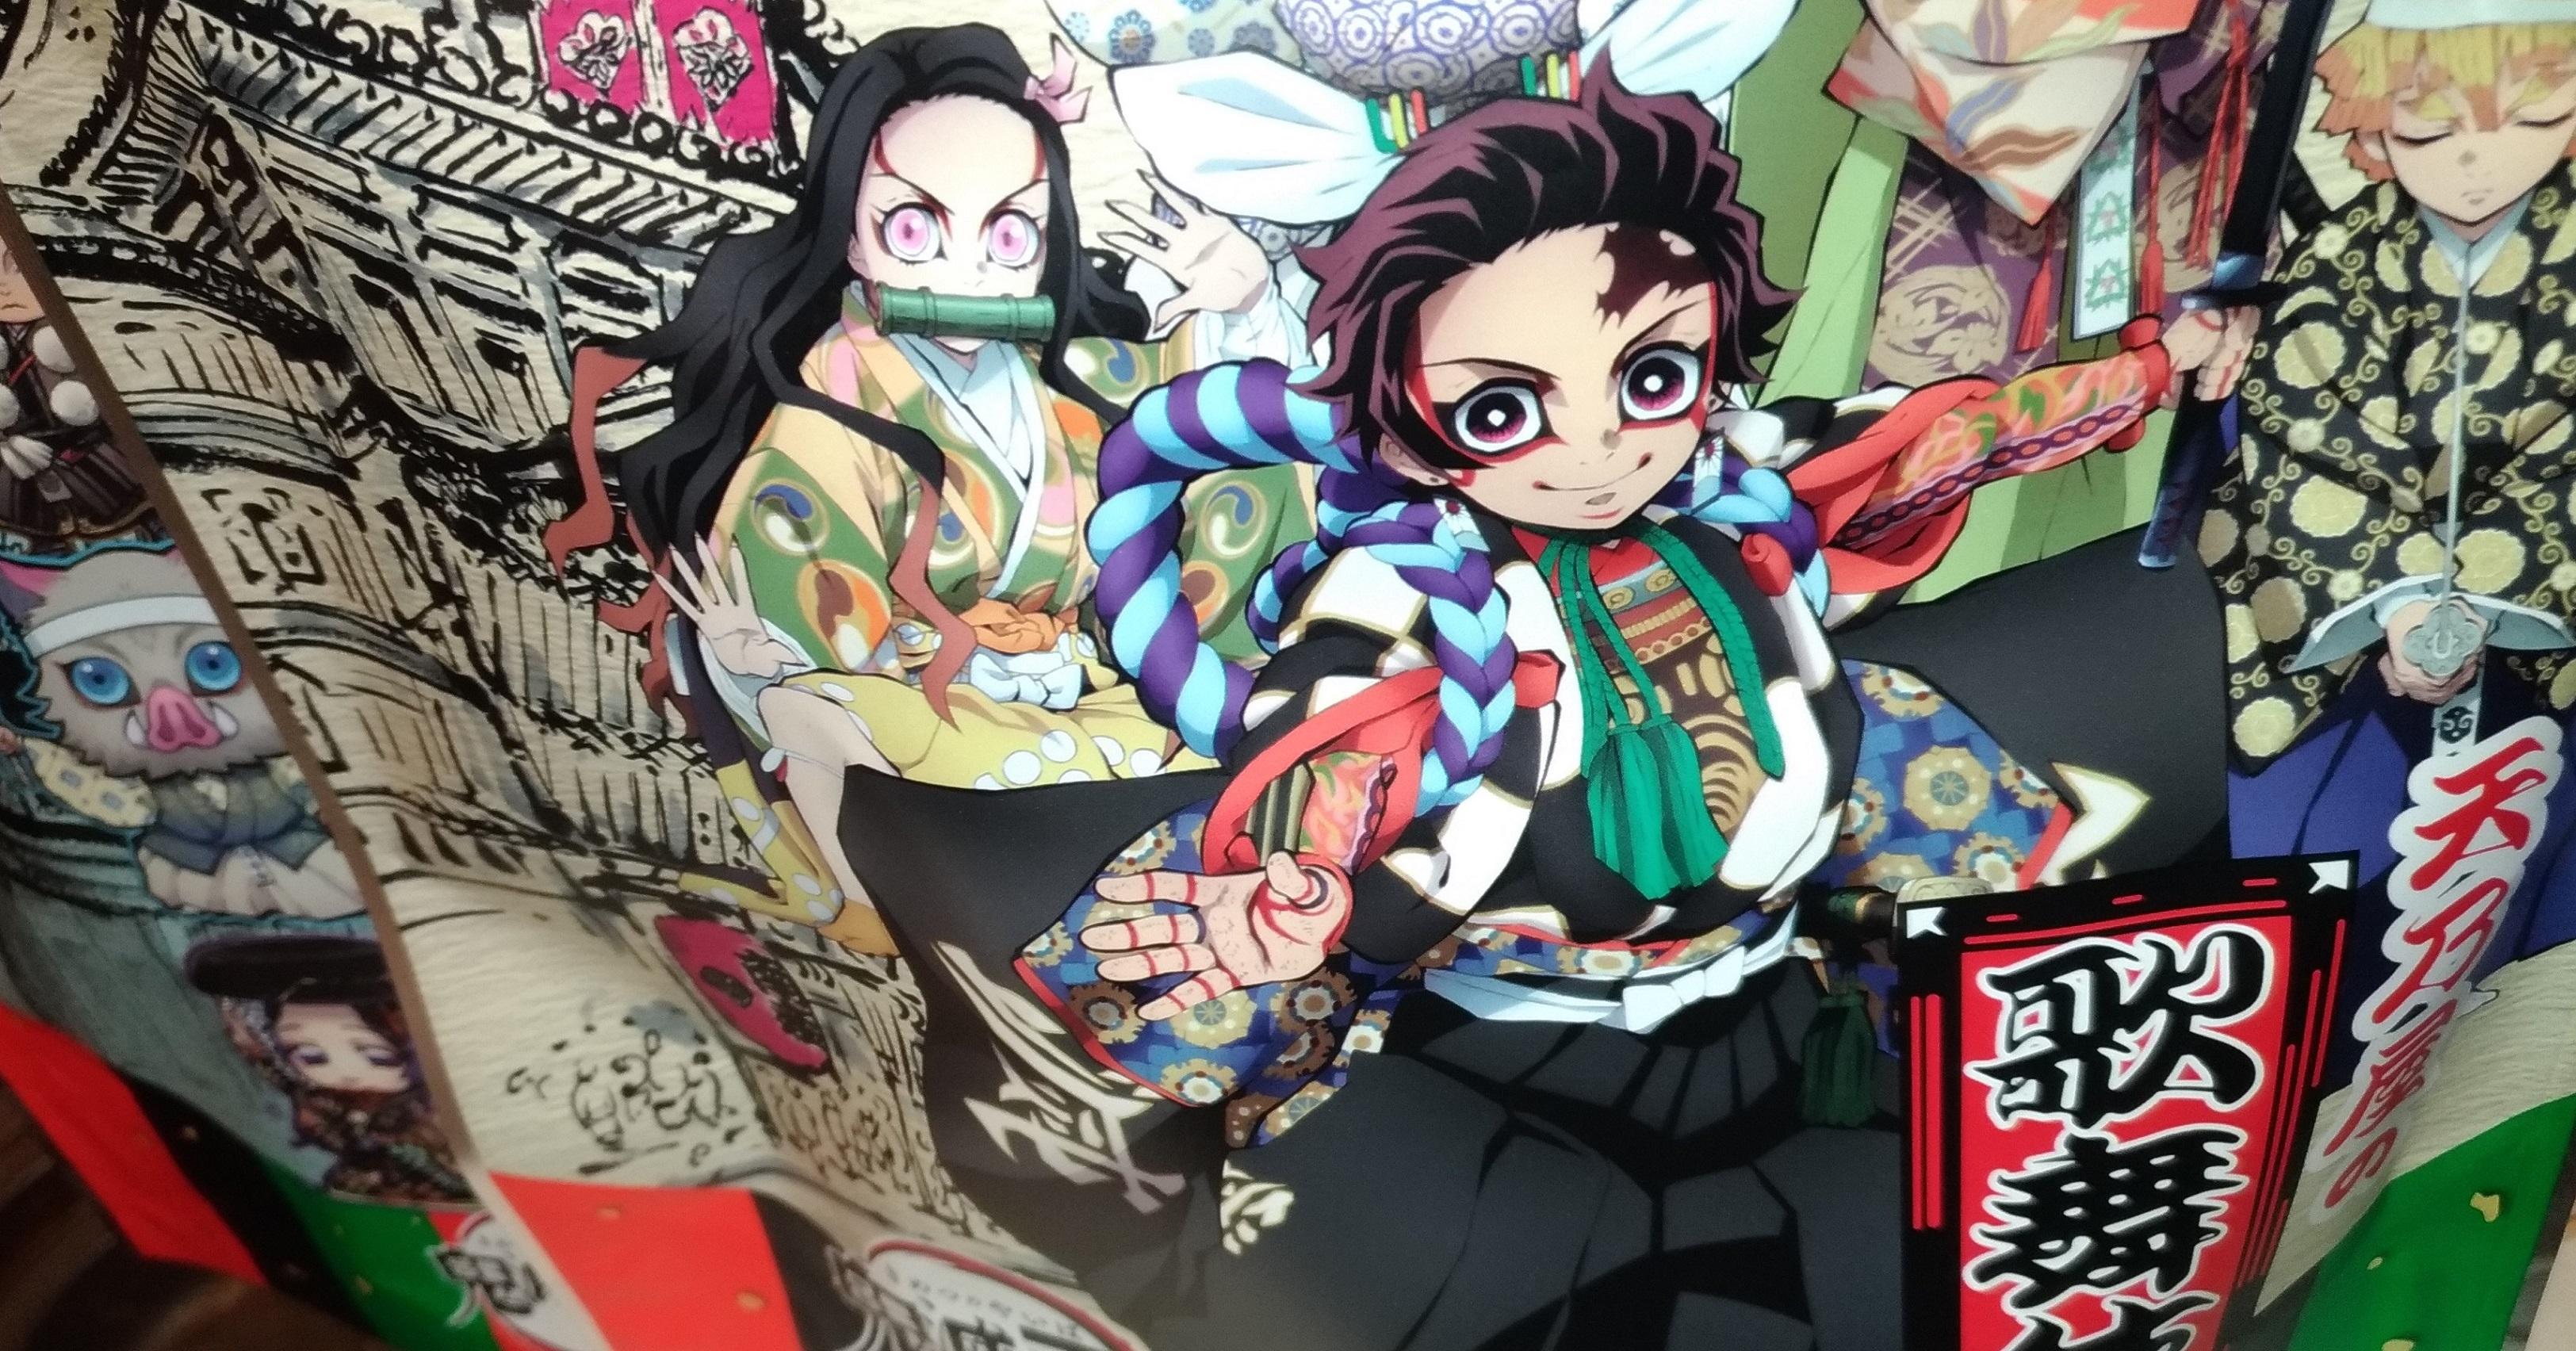 kimetsu_yaiba_1108_kyoto_minami_reviews_blogs_3.jpg